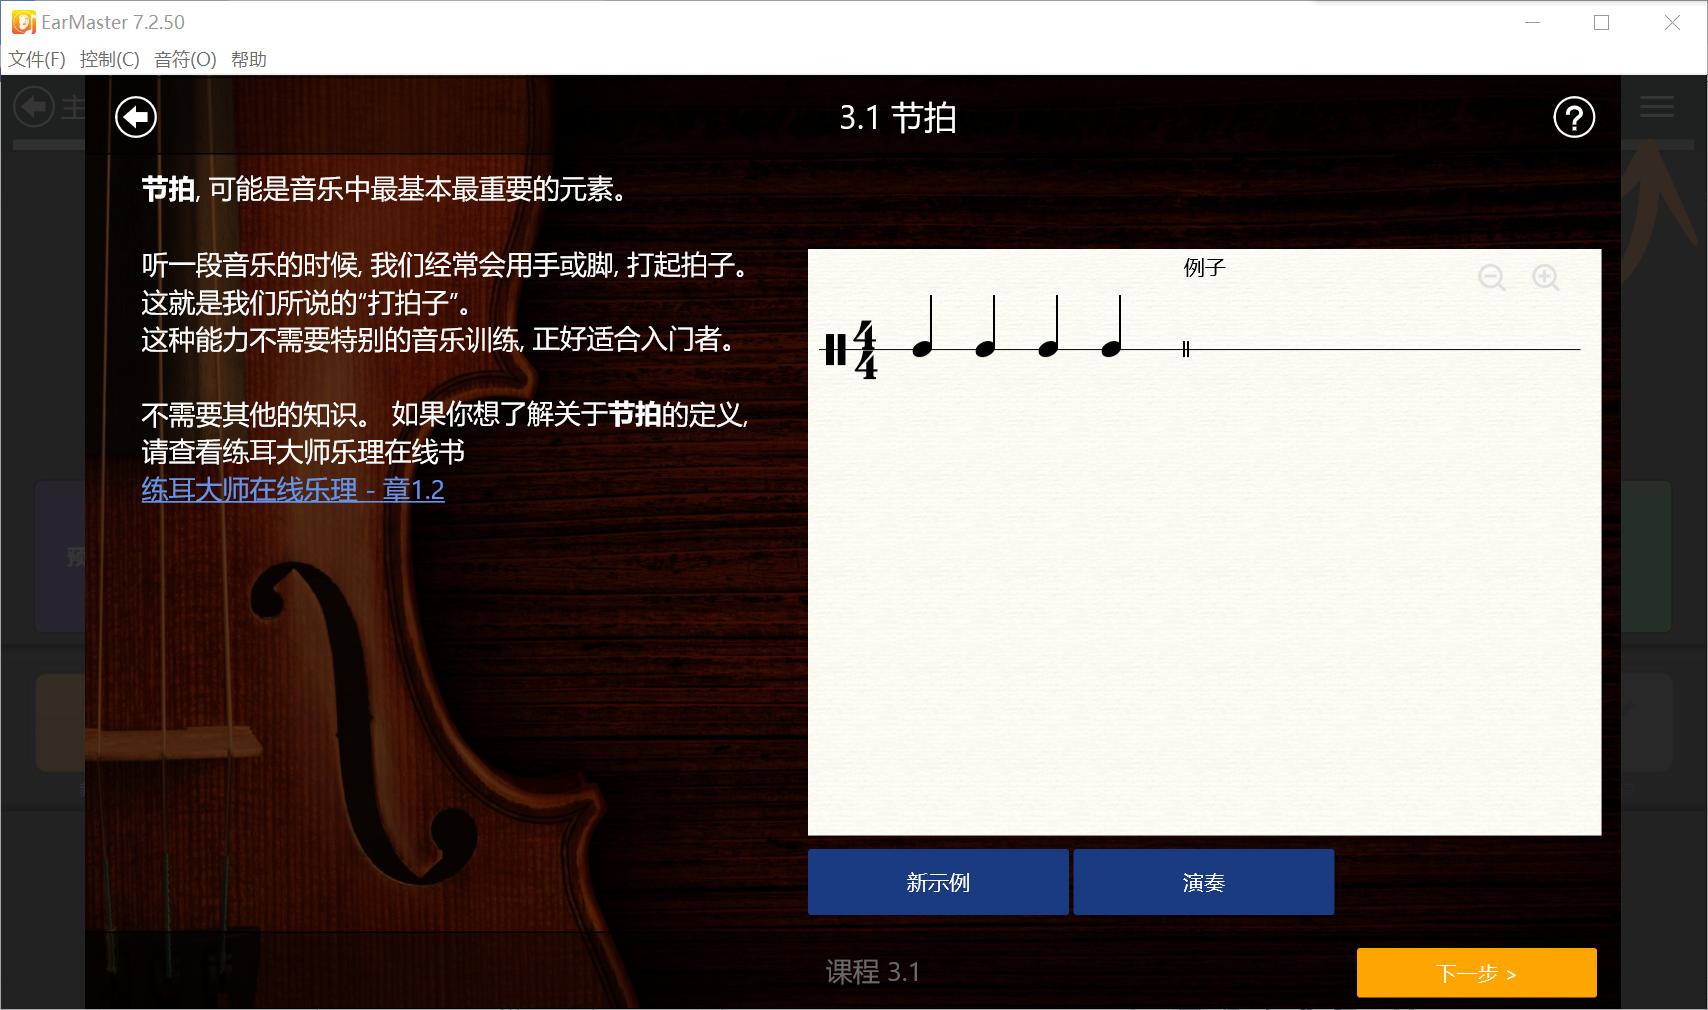 使用EarMaster学习复合节拍